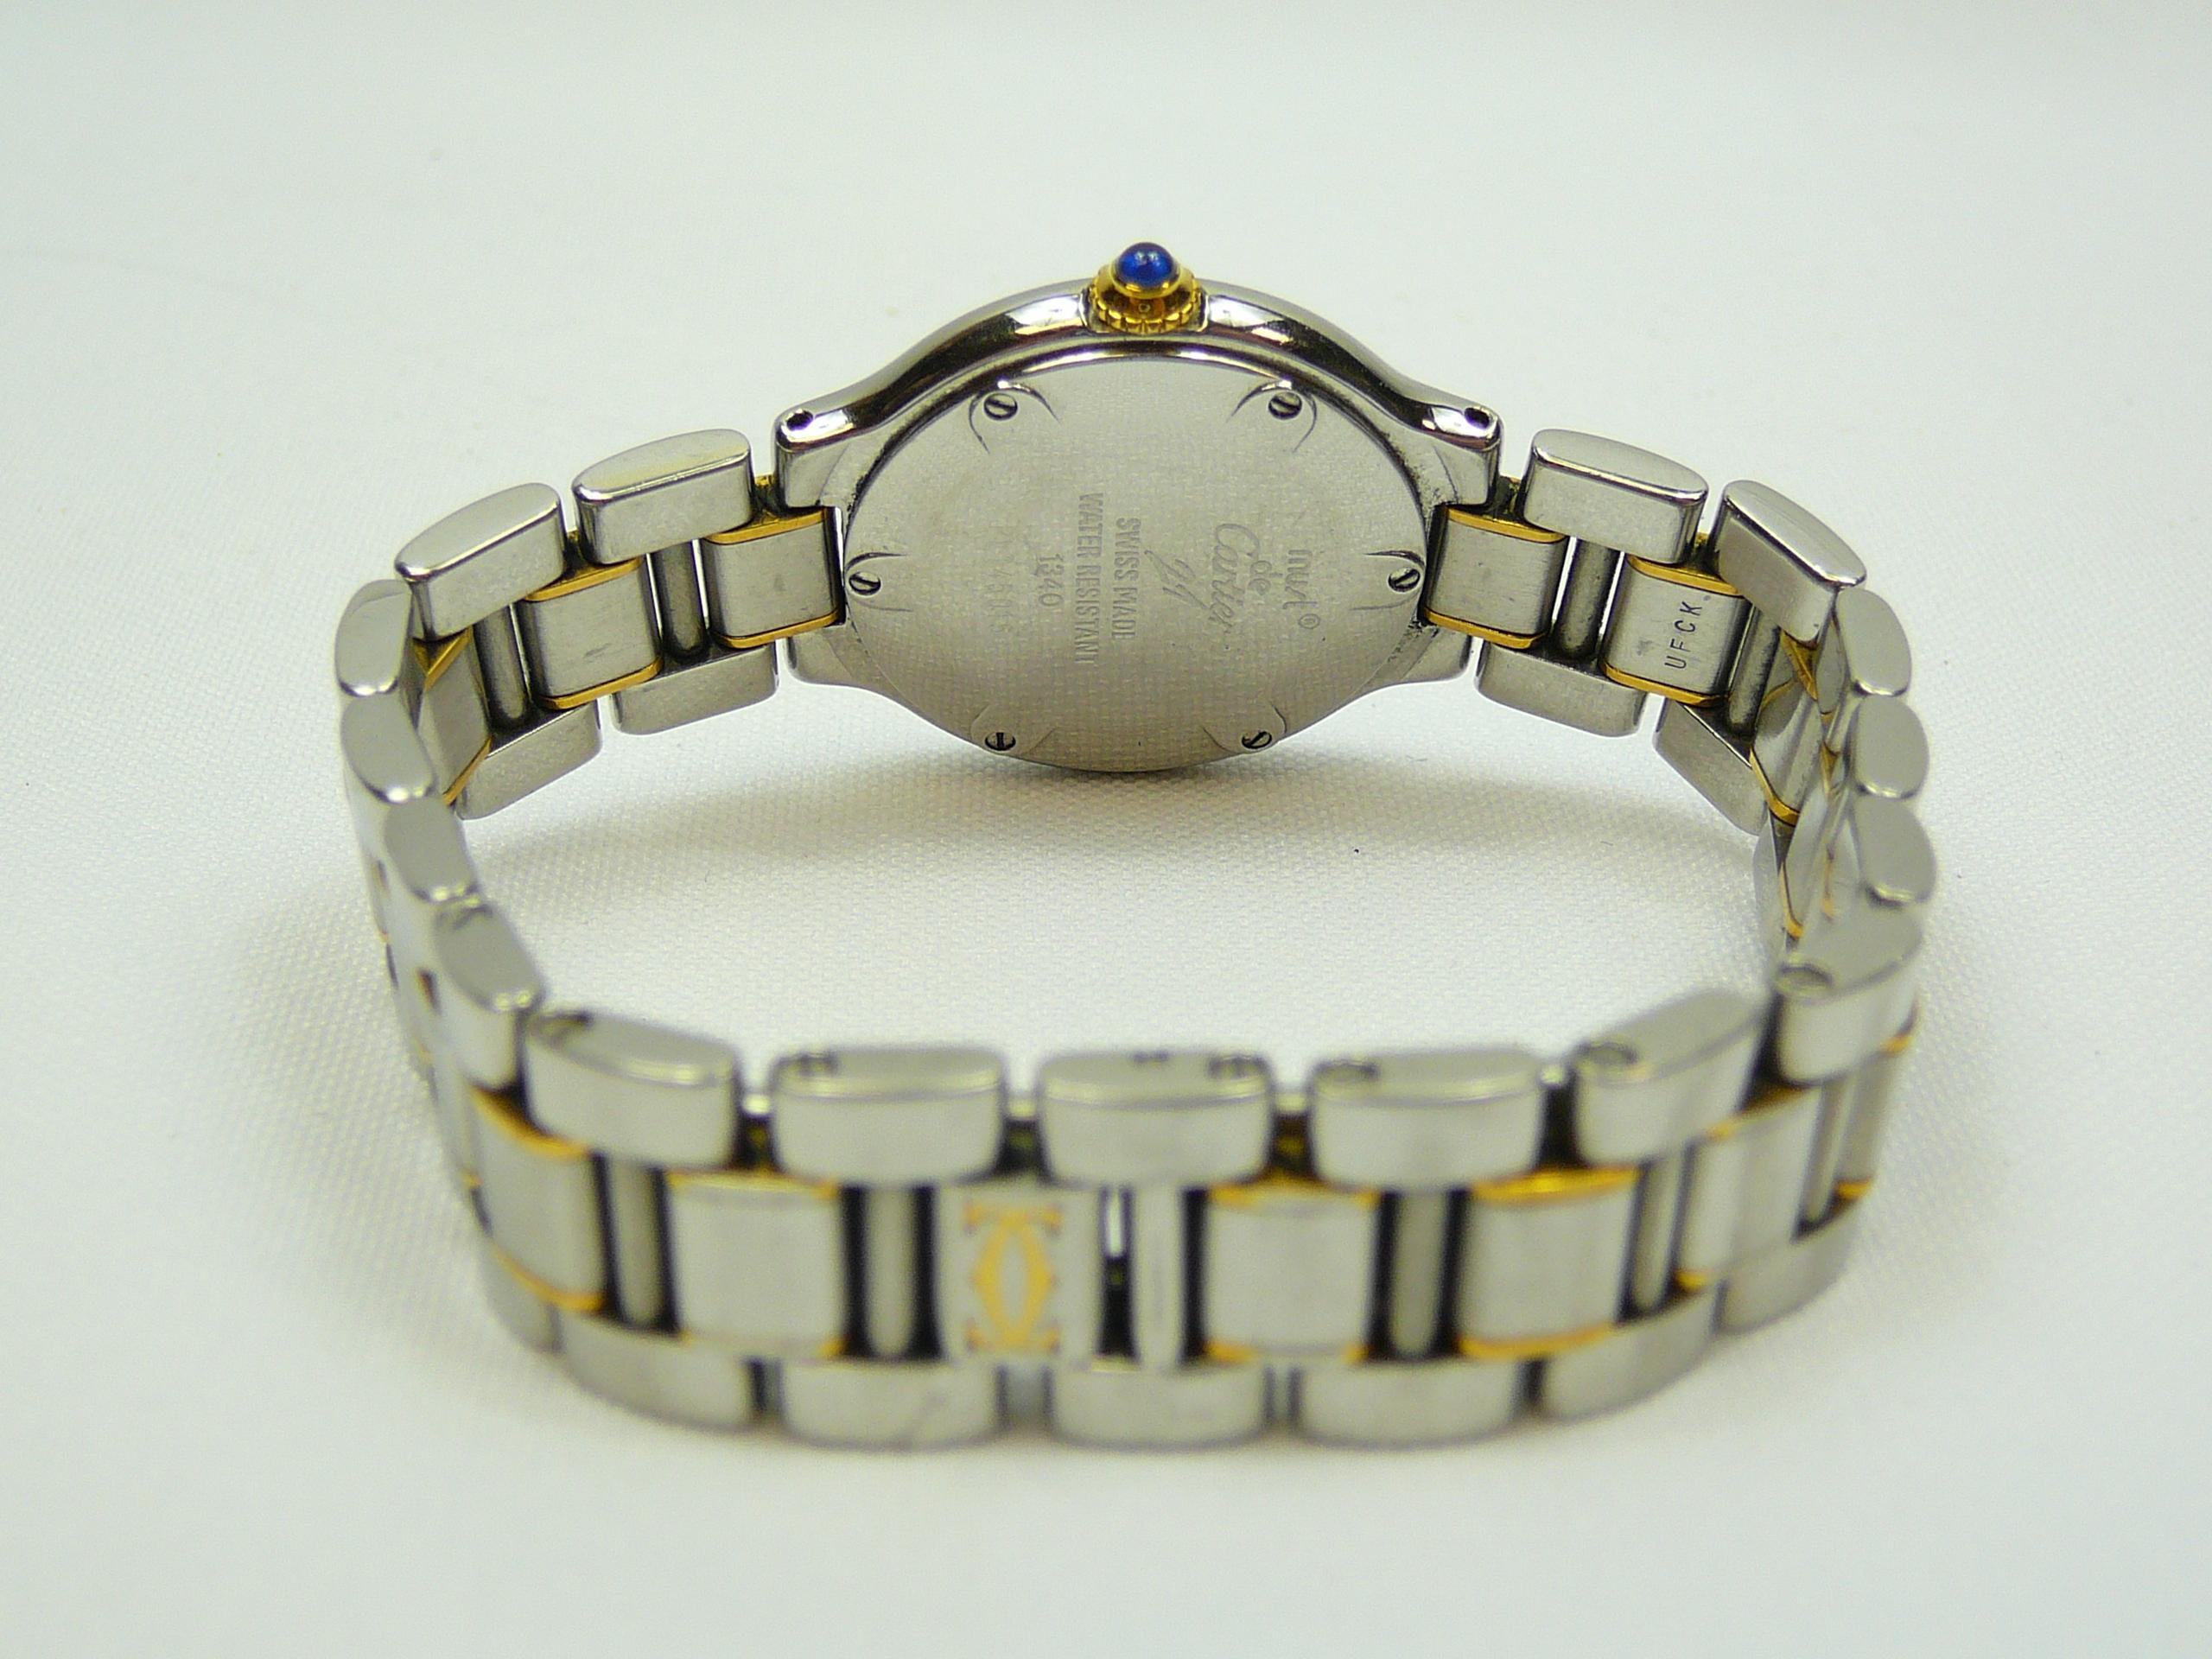 Ladies Cartier Wrist Watch - Image 3 of 3